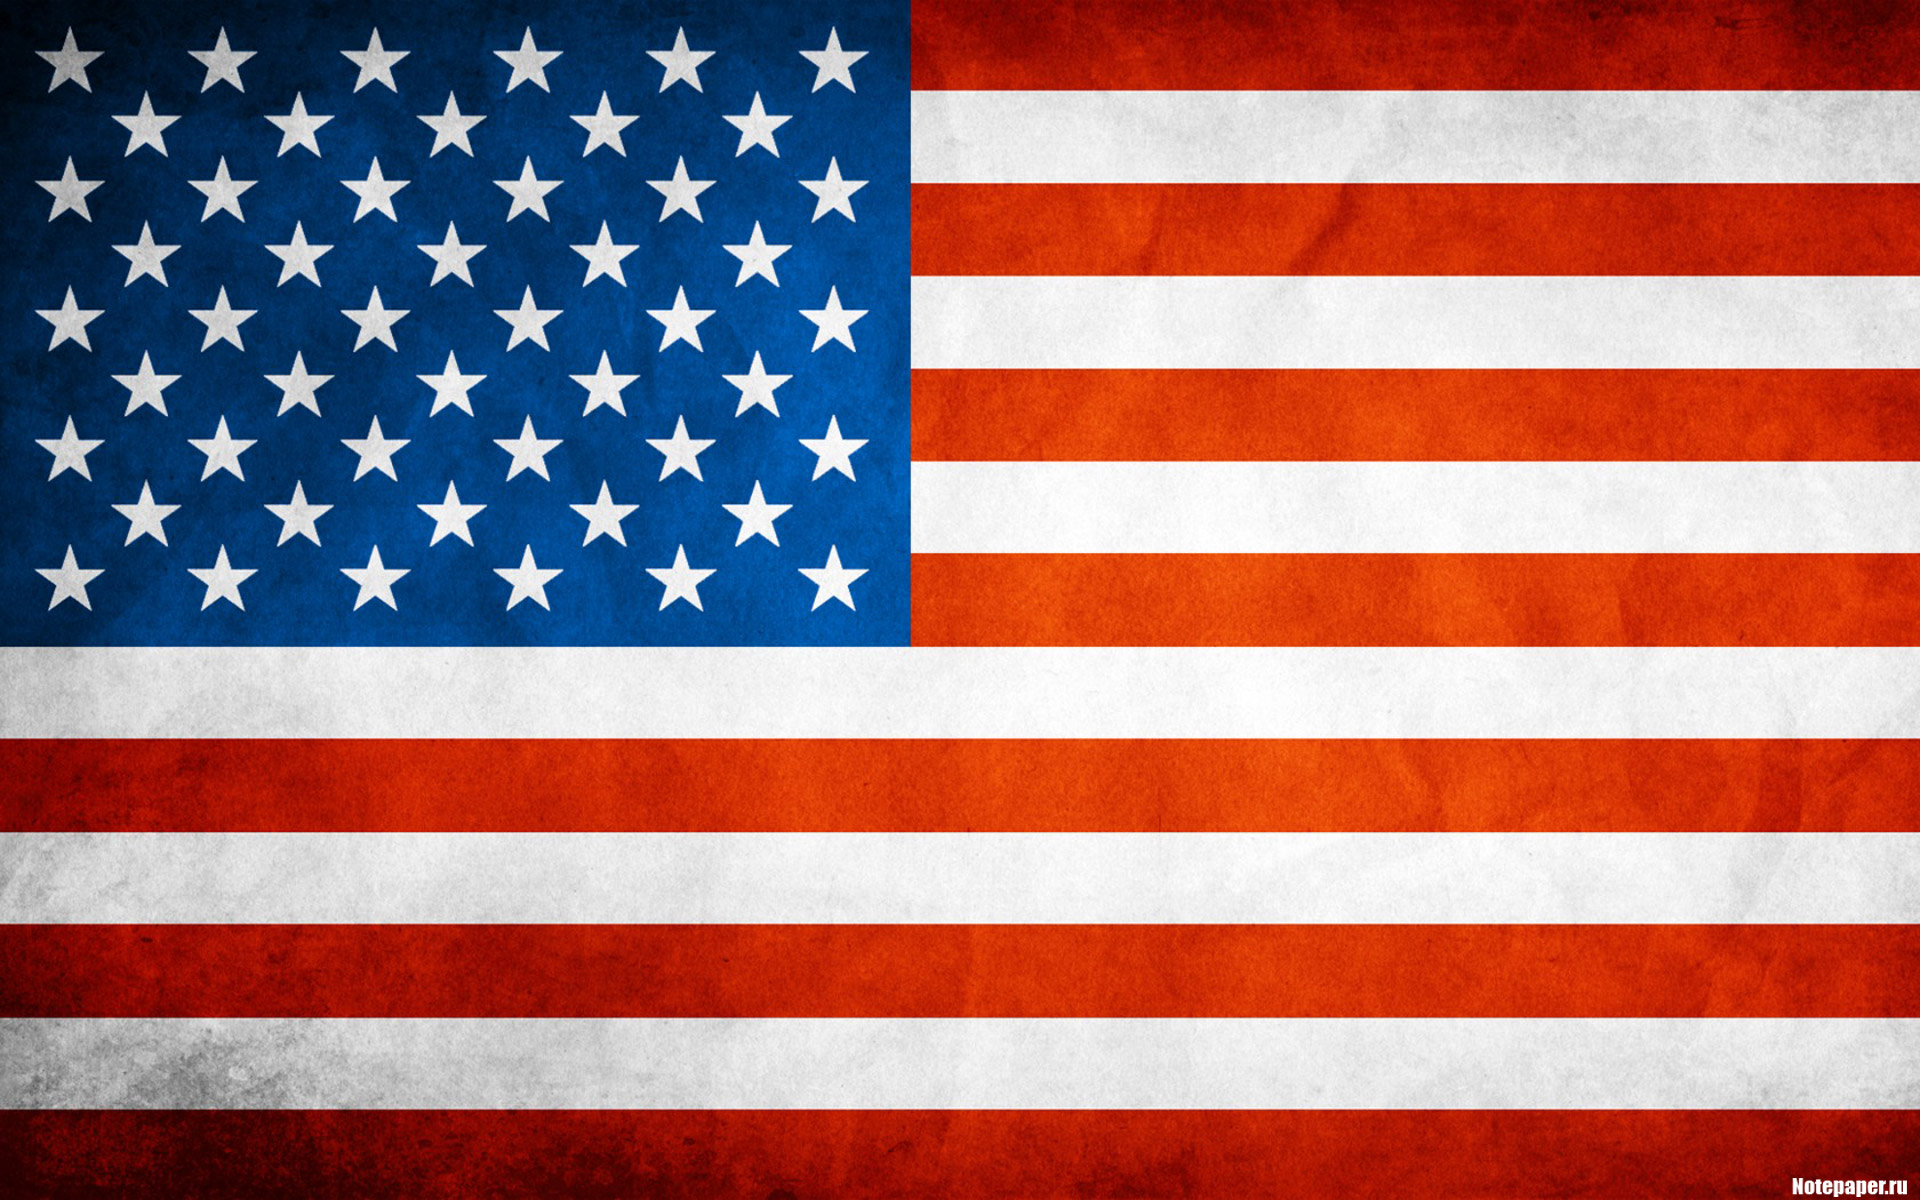 America Wallpaper, Popular Backgrounds | America HD Widescreen